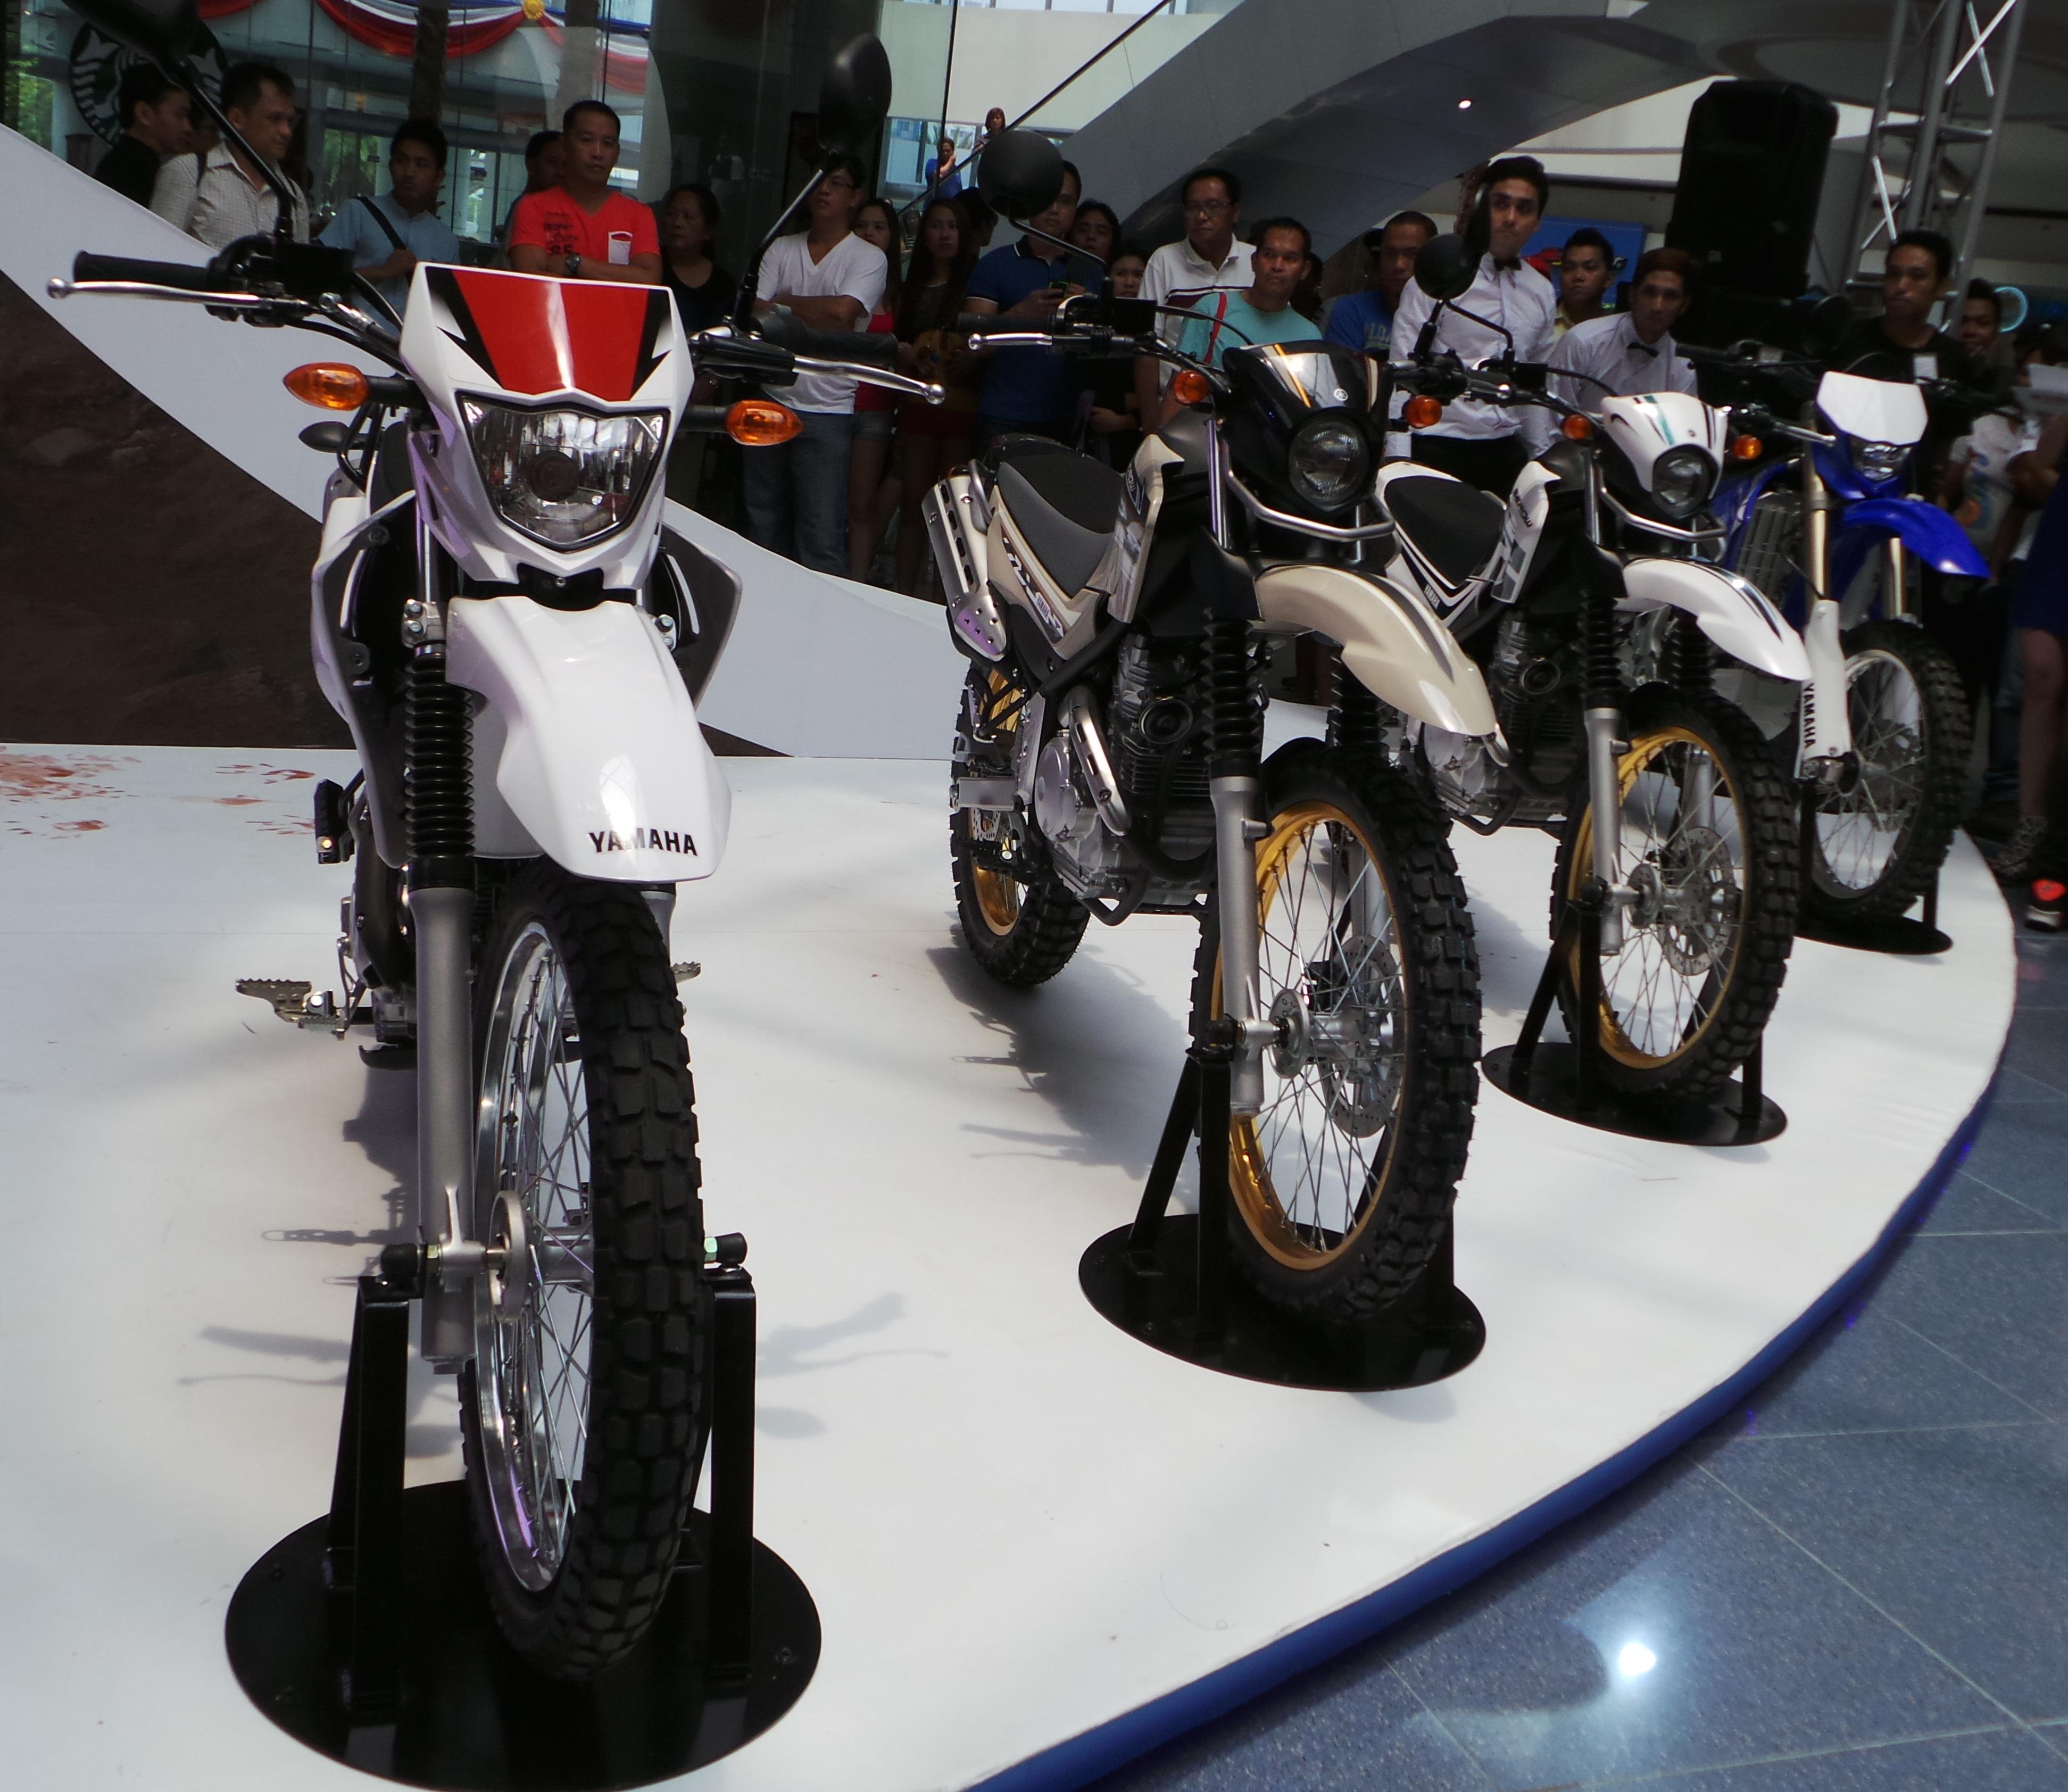 Yamaha international motorshow revs your heart at sm mall